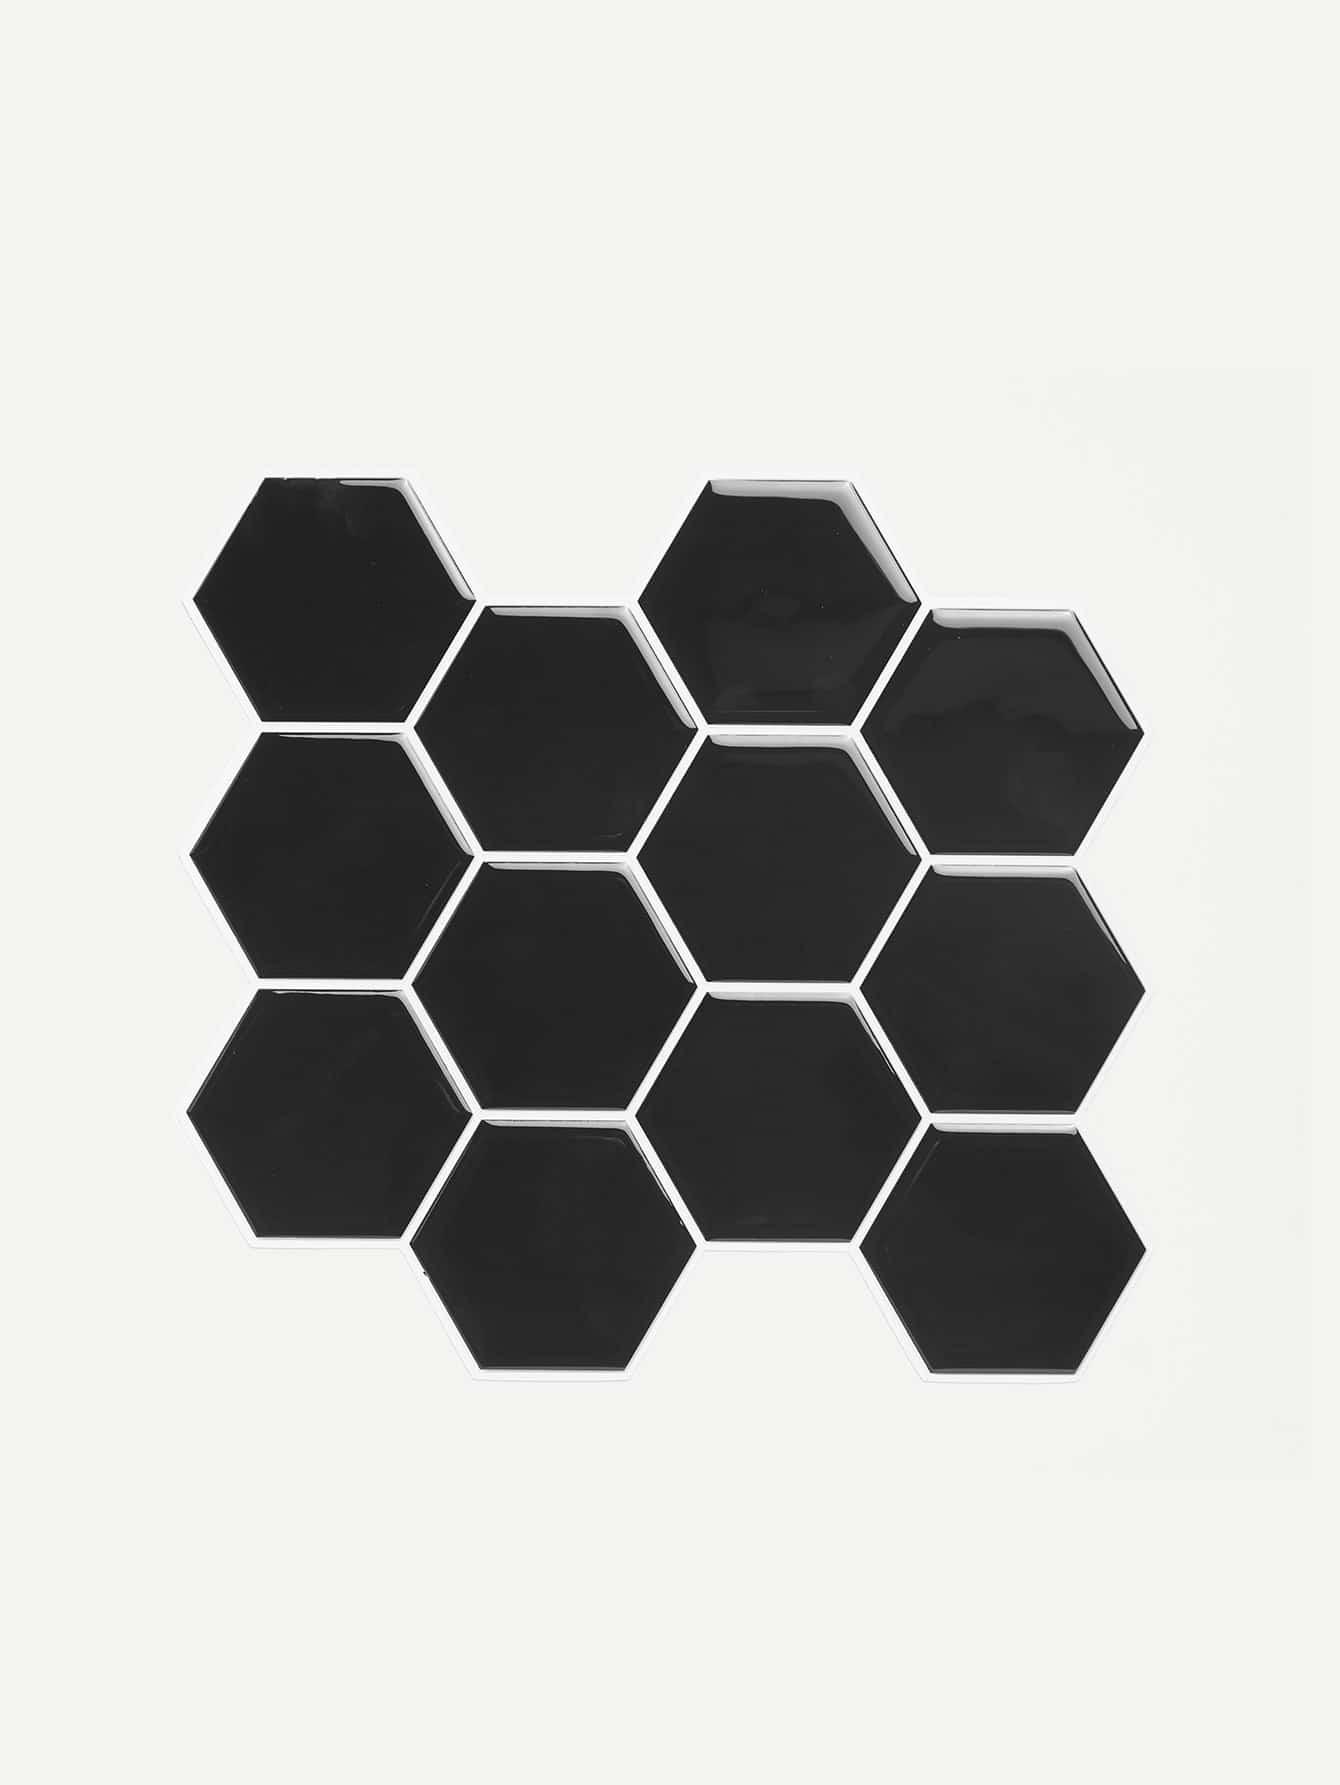 Hexagon Pattern Wall Tiles atlantic 26355 45 31